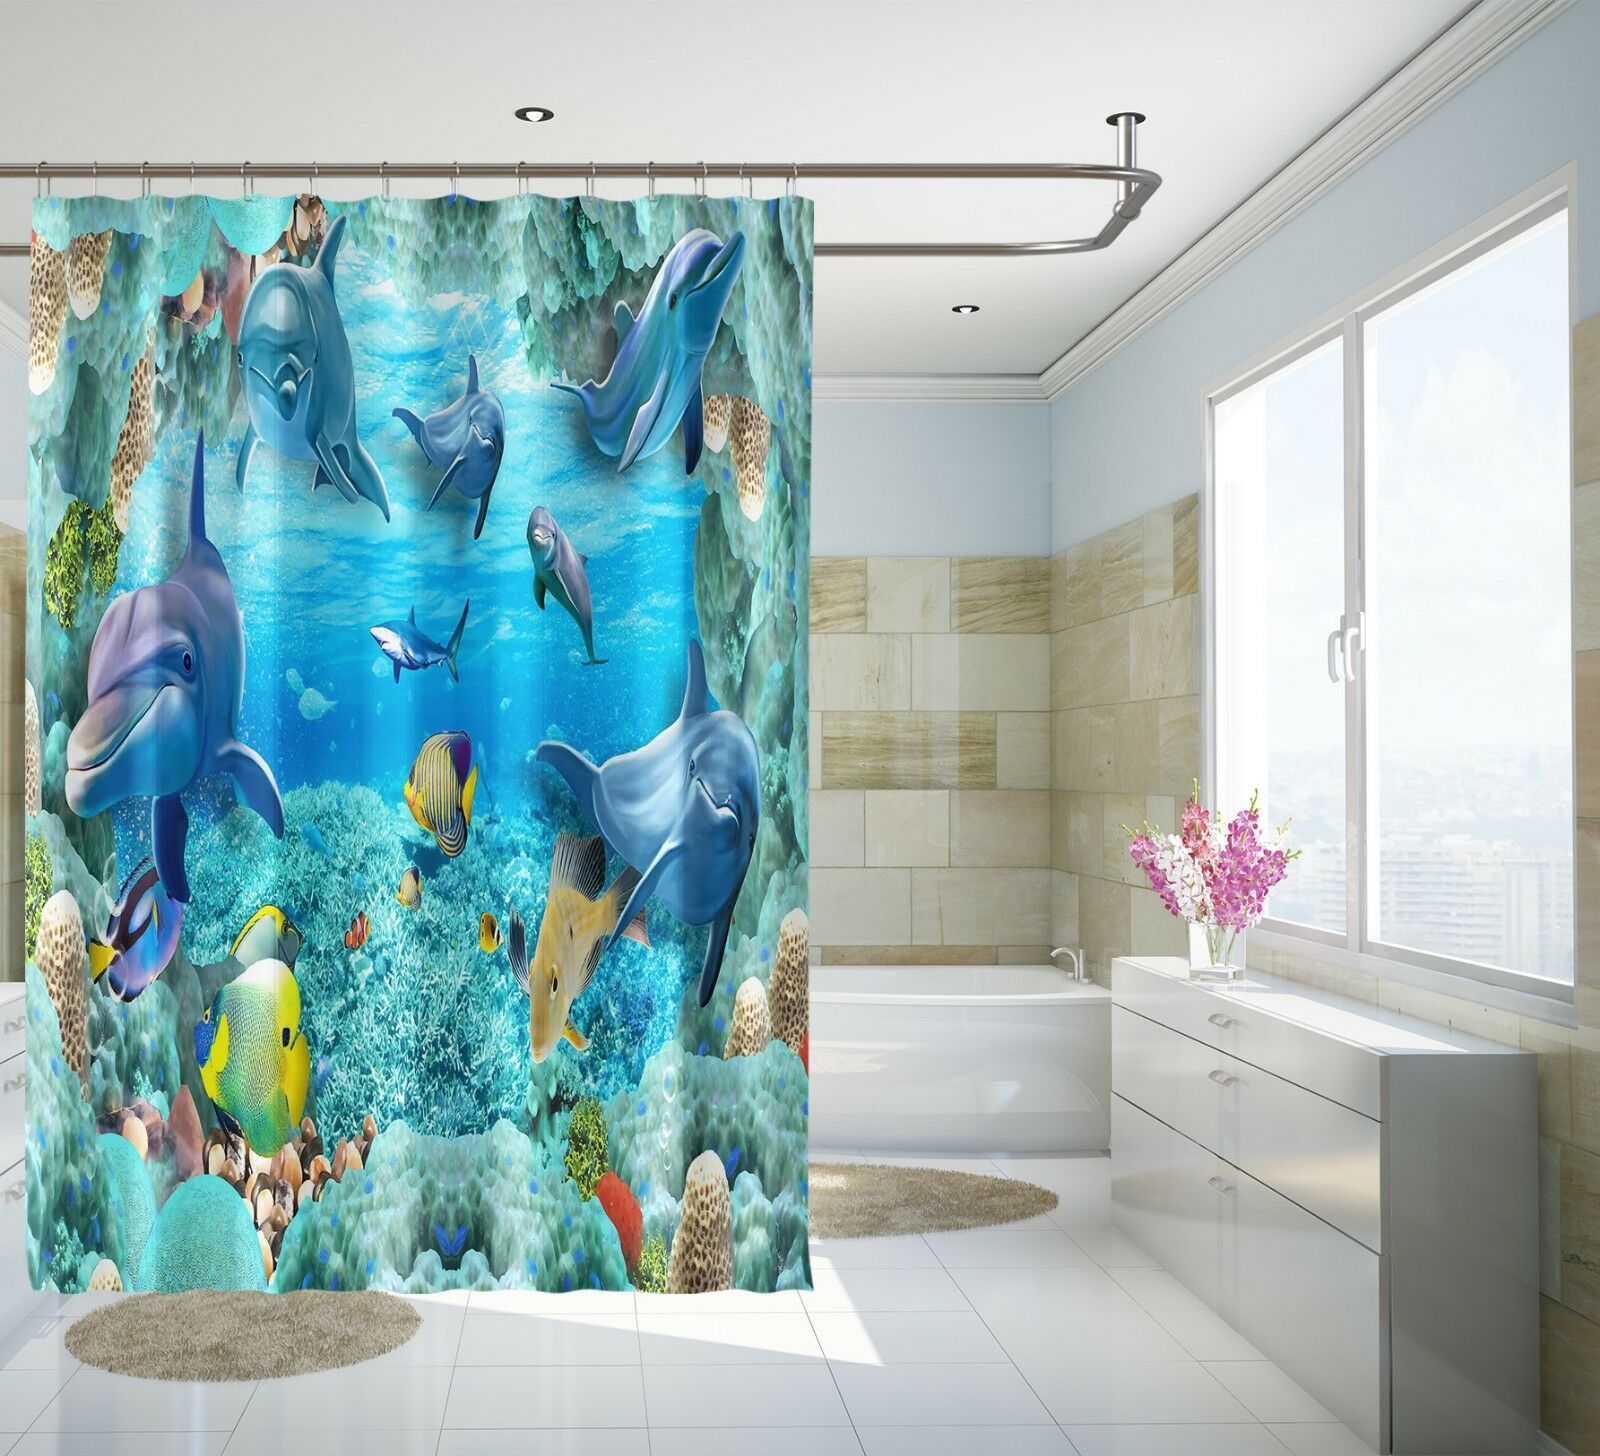 3D Dolphin 46 46 46 Shower Curtain Waterproof Fiber Bathroom Home Windows Toilet Lemon b2581b